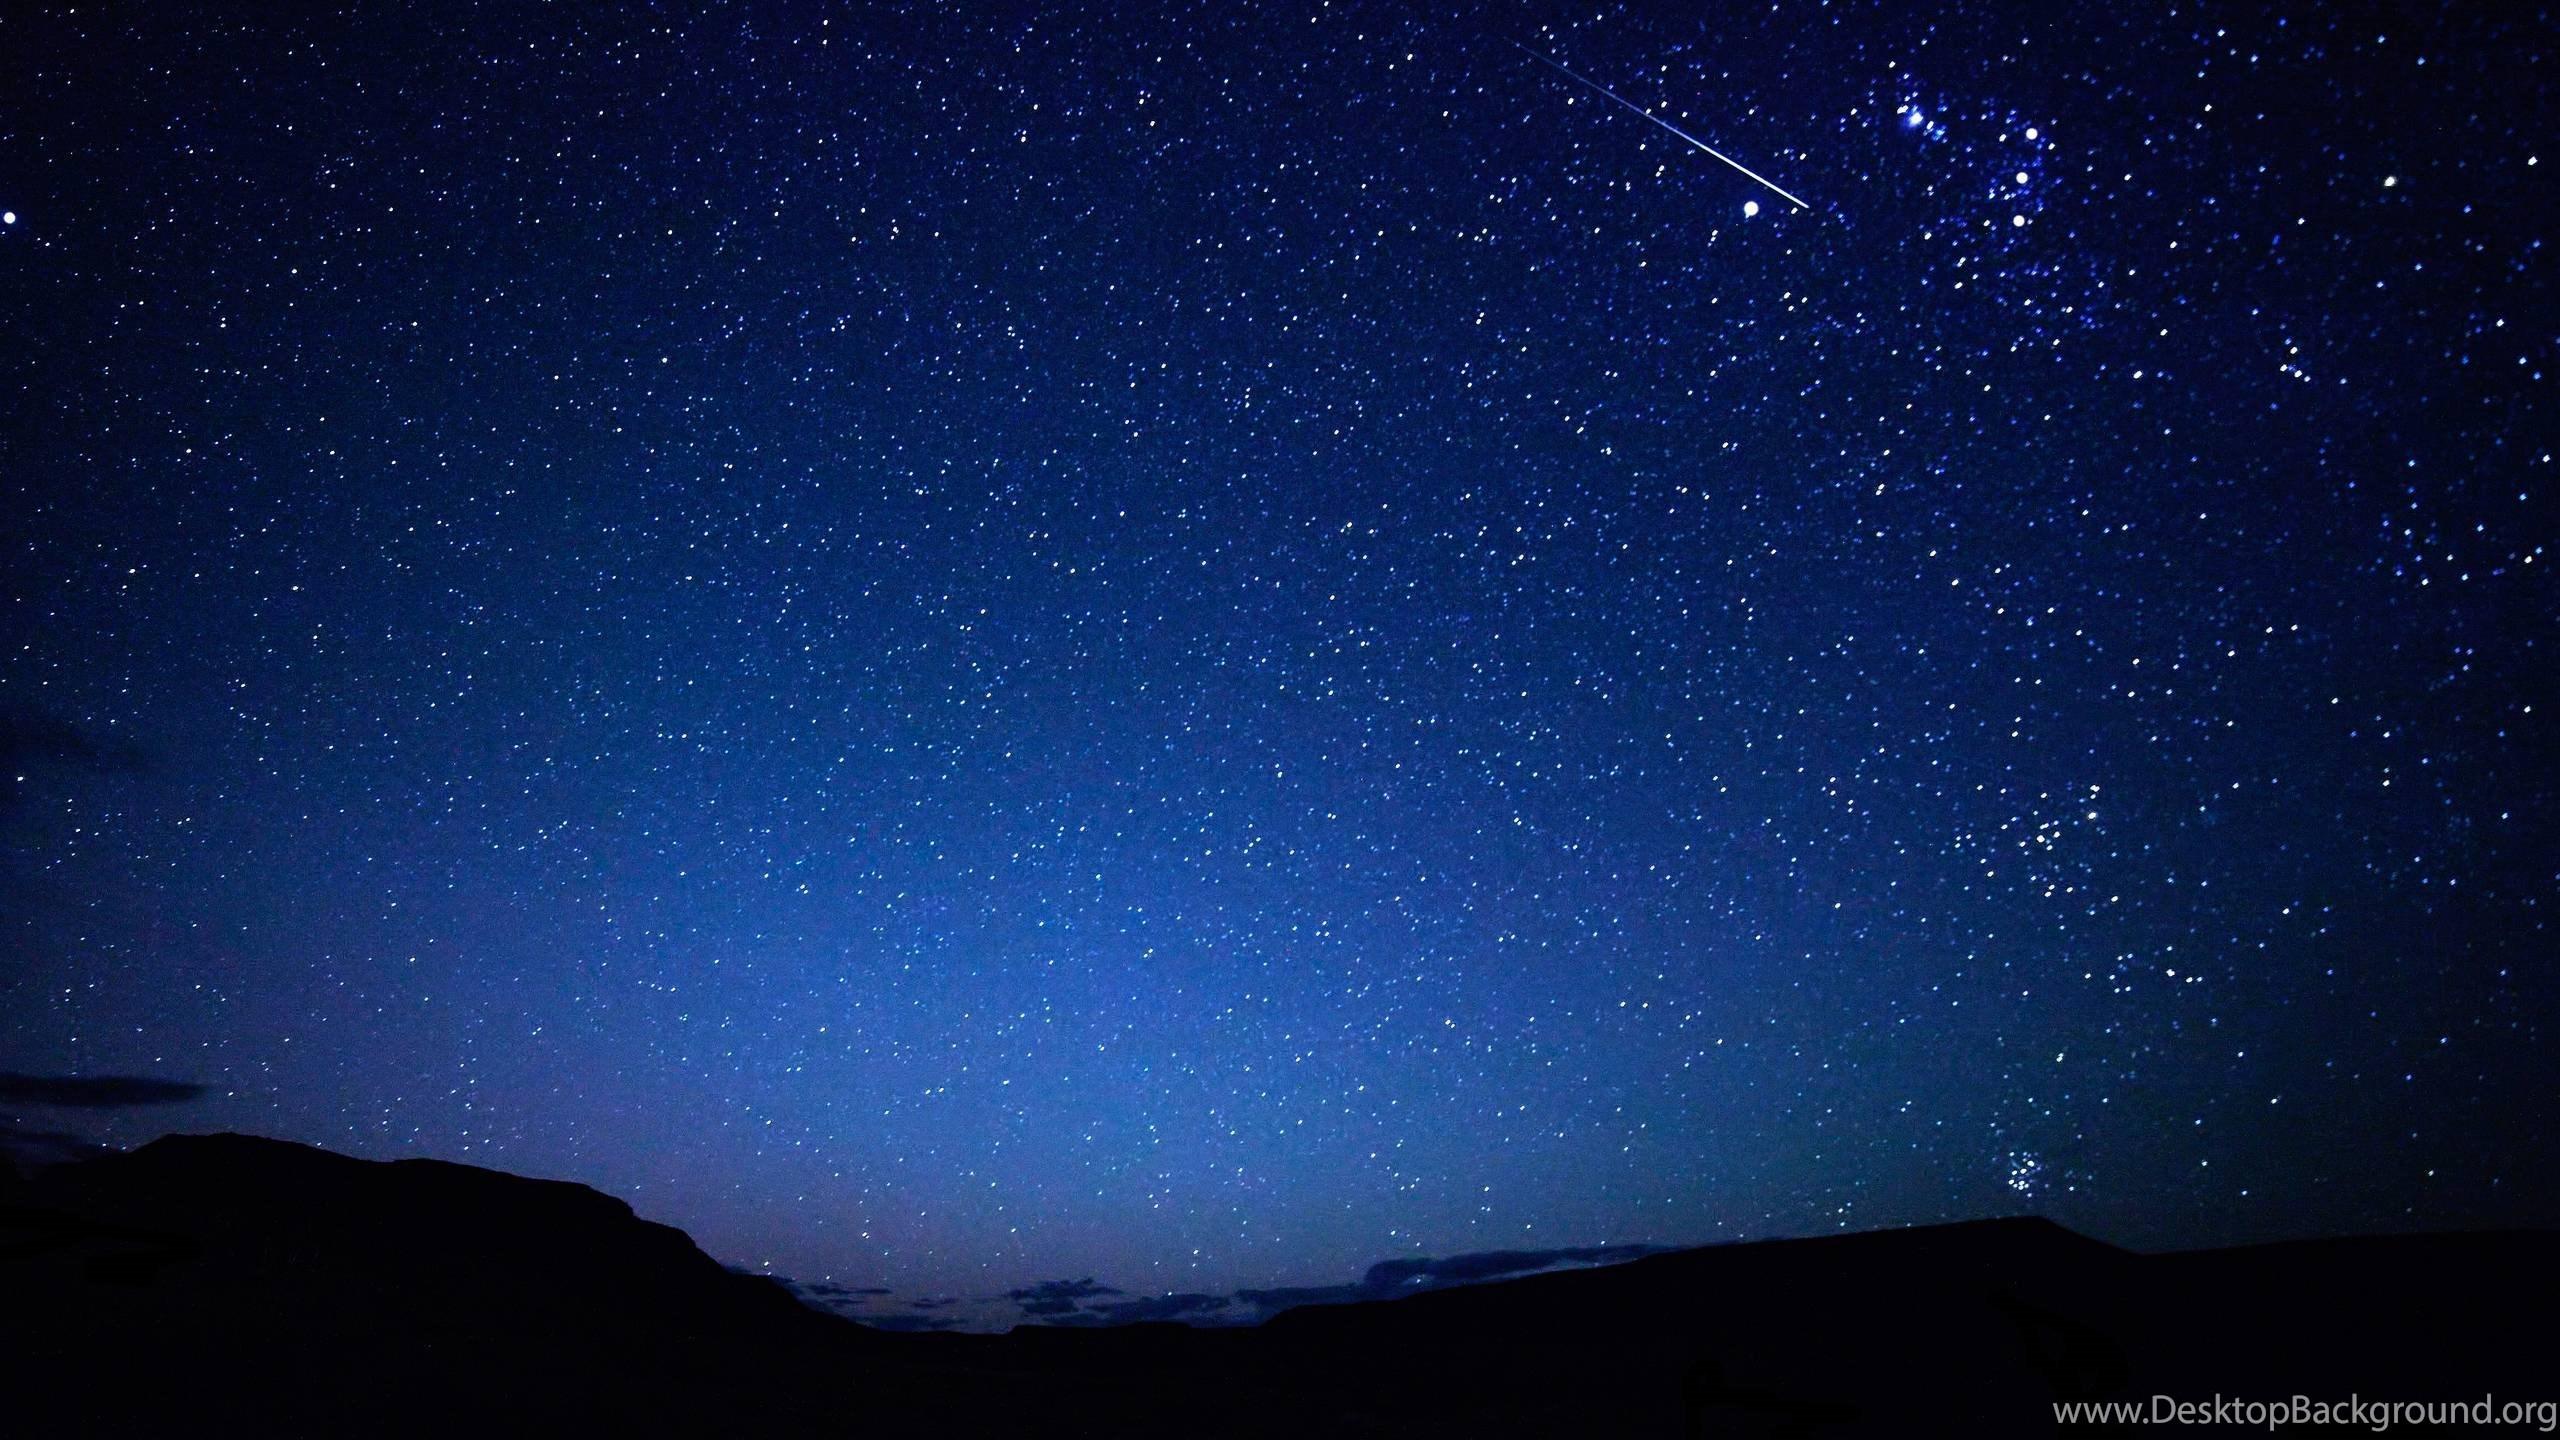 night sky stars wallpapers desktop background